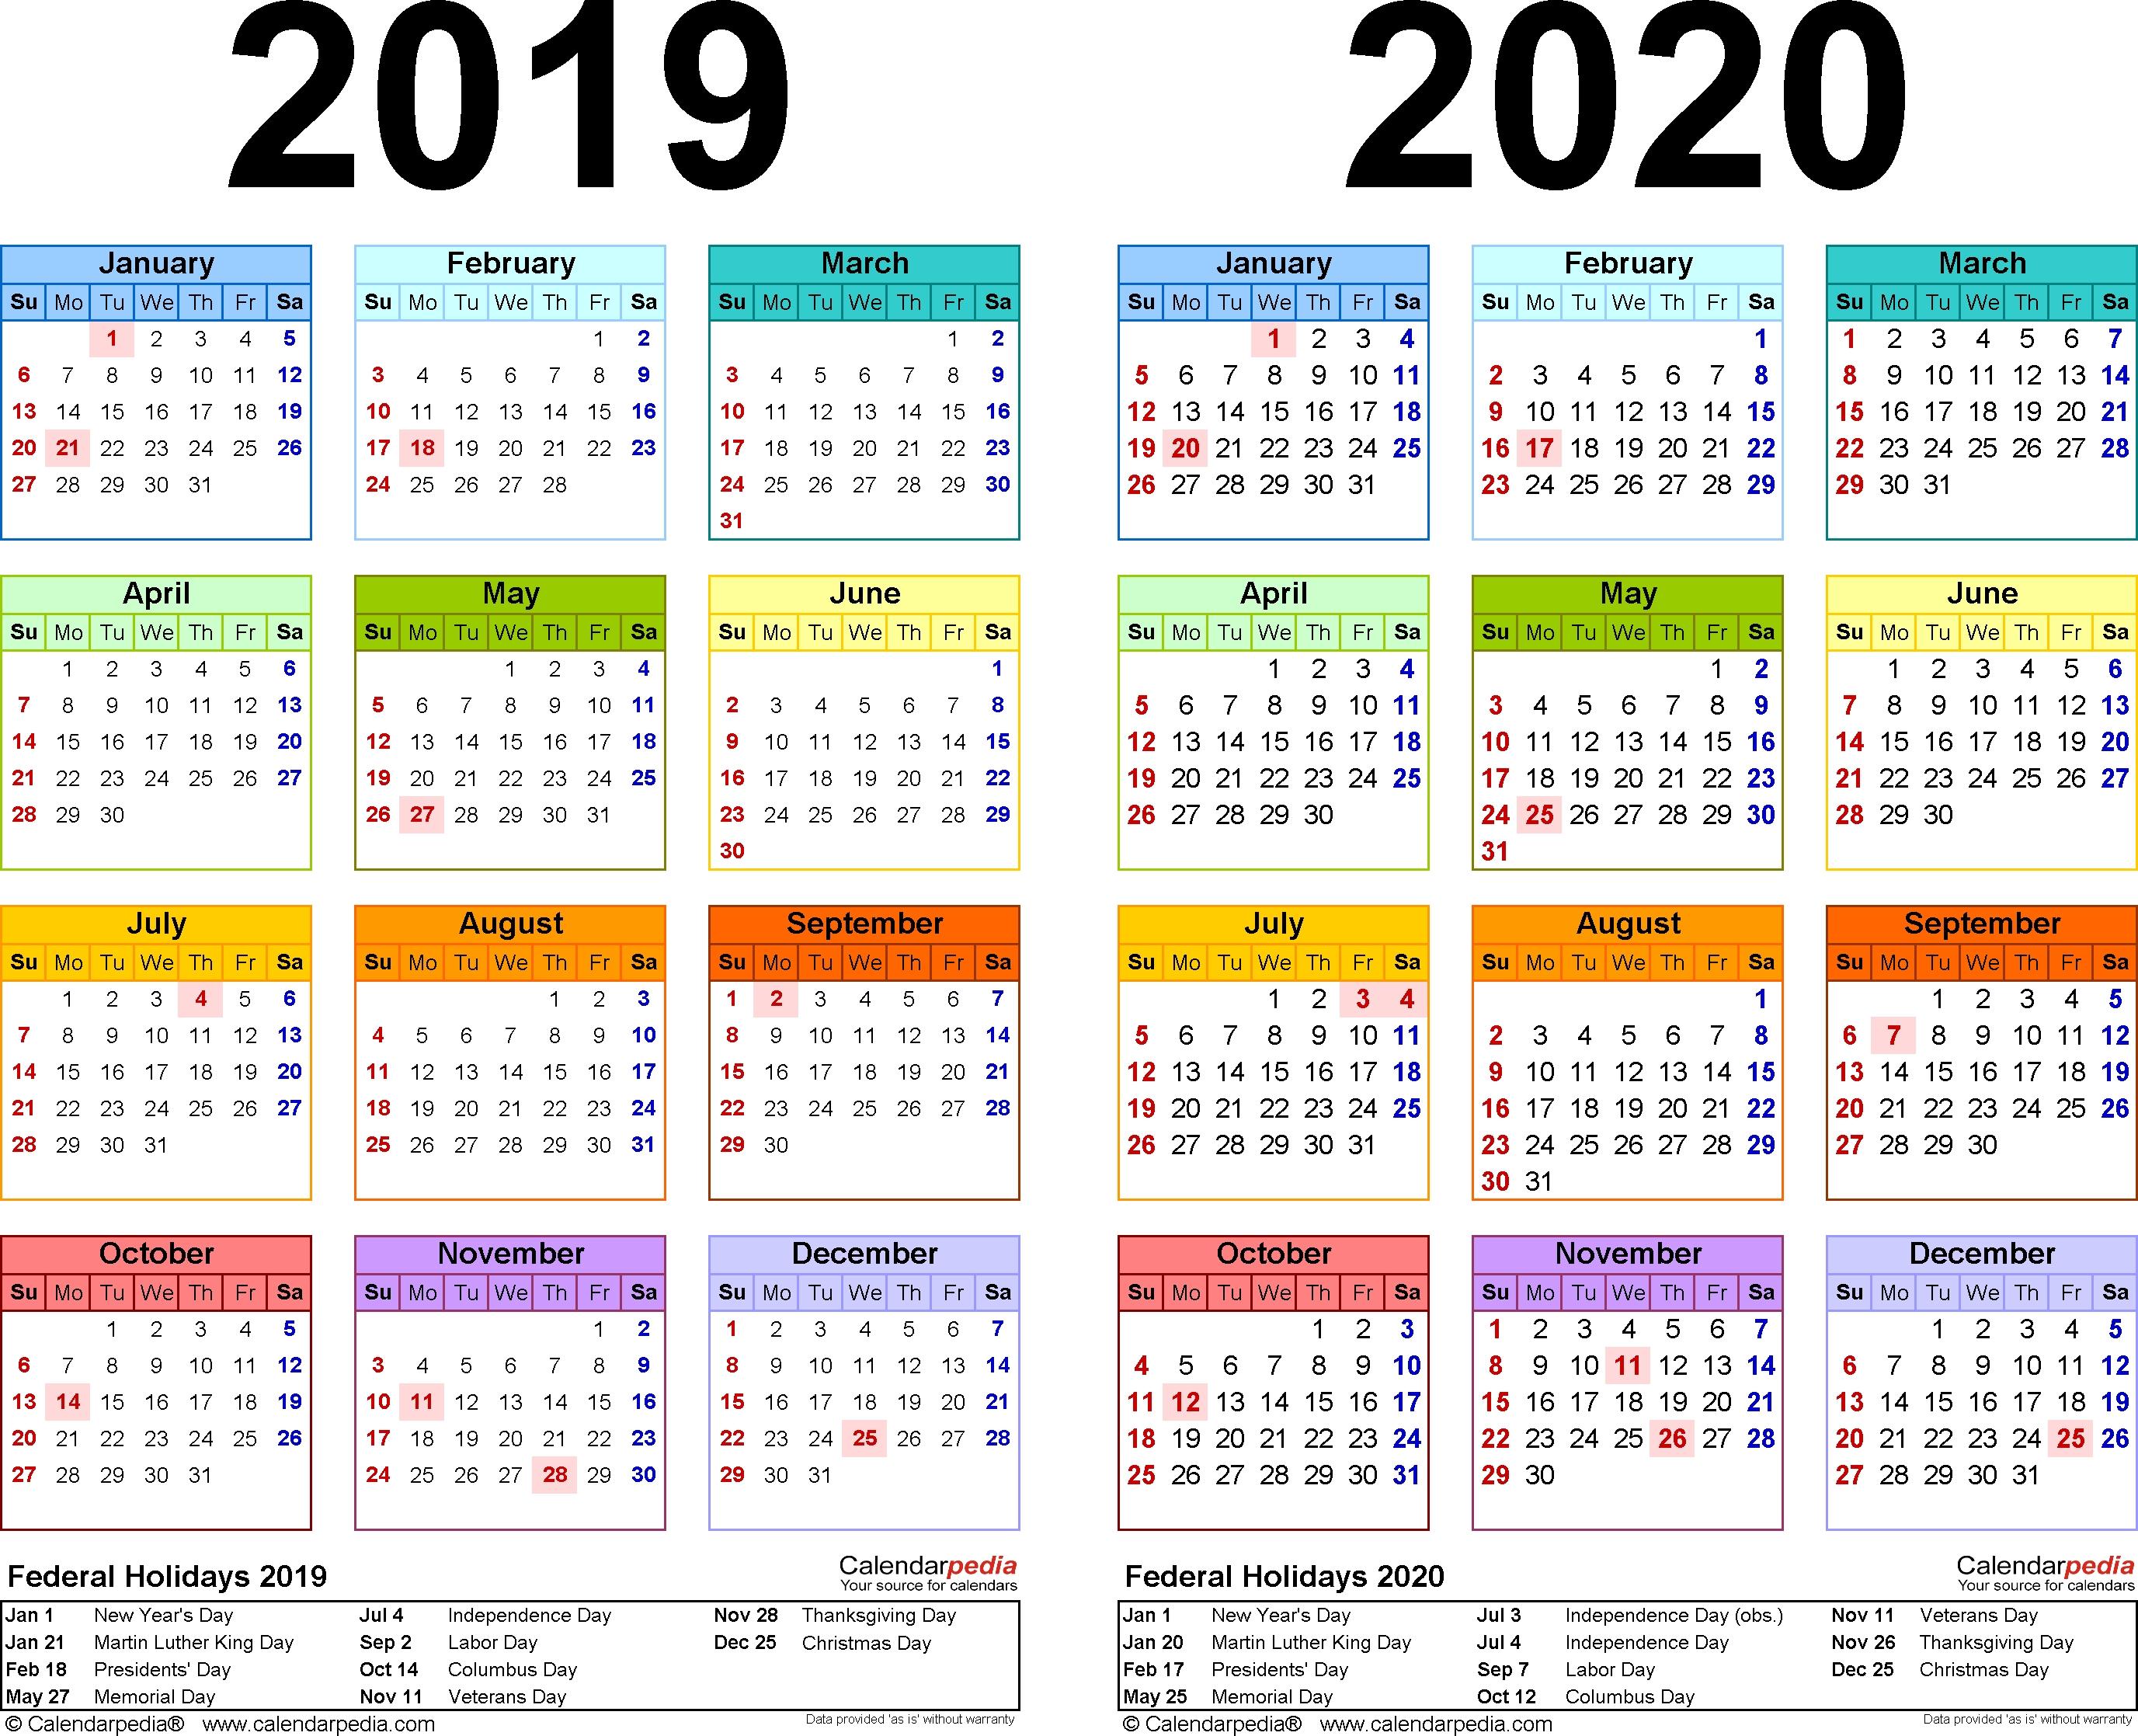 November 2020 Calendar Australia 2 - Wpa.wpart.co throughout Calendar 2020 Australia